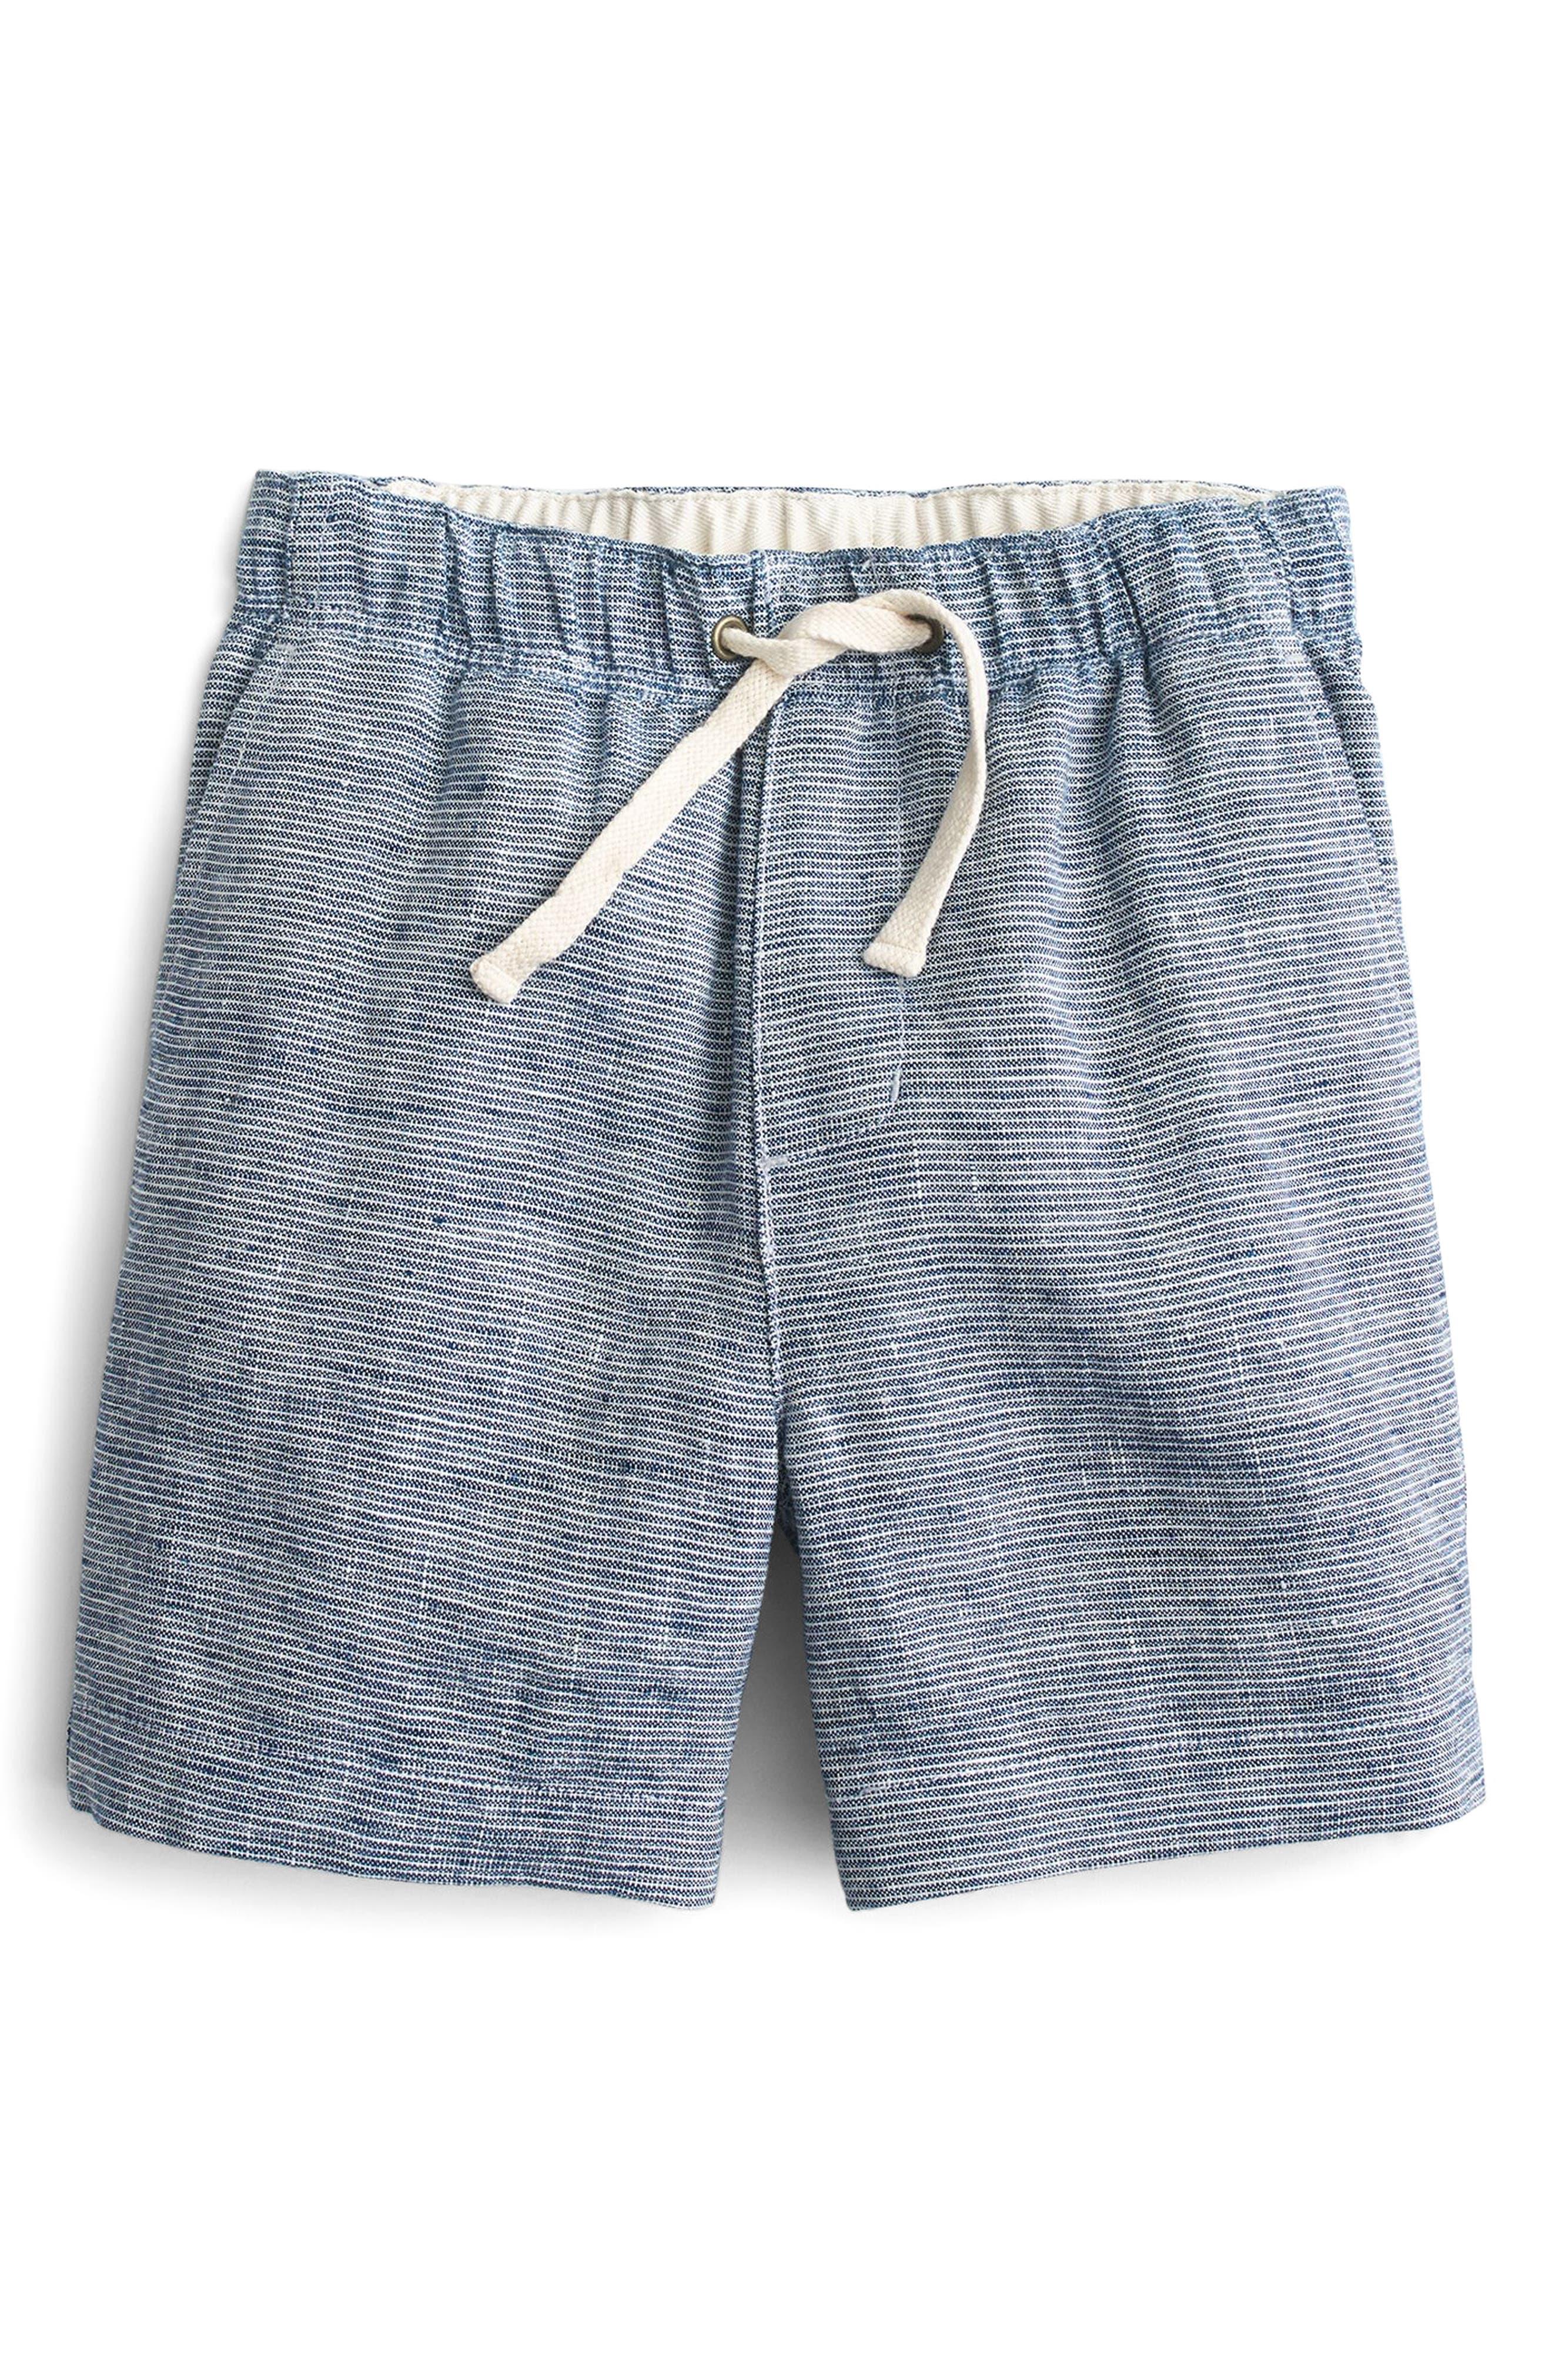 Stripe Linen Dock Shorts,                         Main,                         color, Blue Chester Stripe